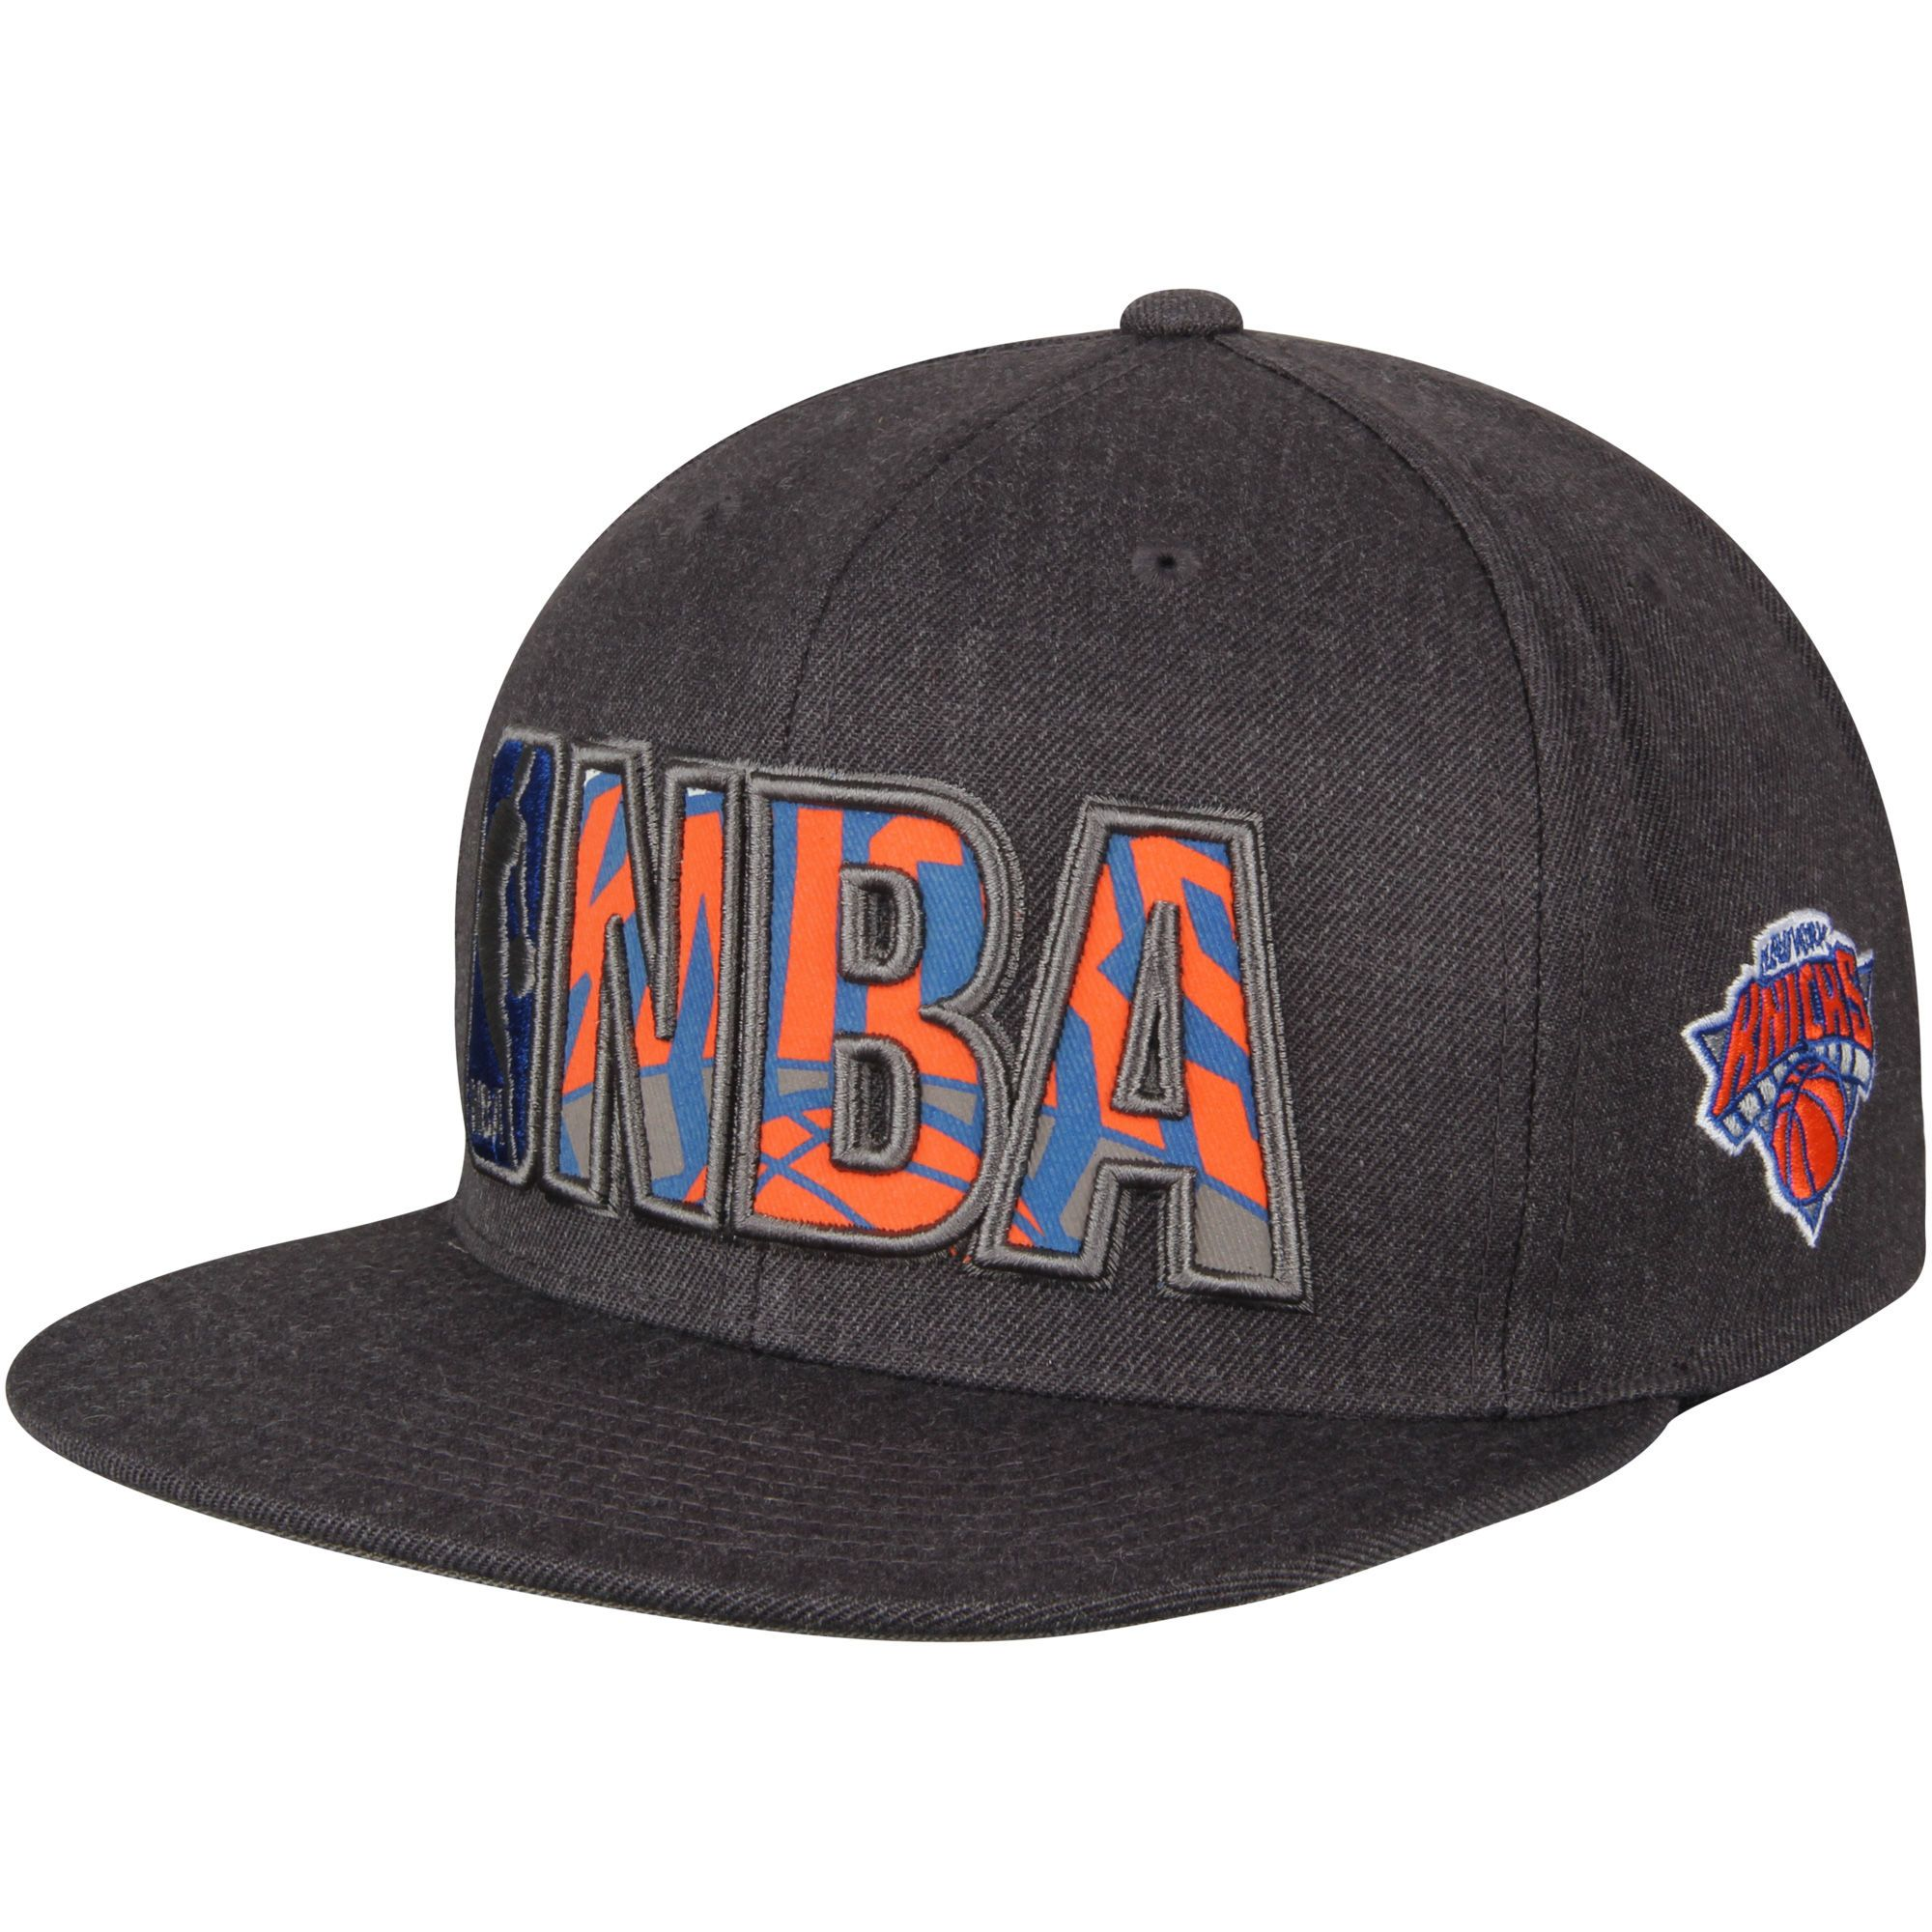 ca893e33d54 Mitchell   Ness New York Knicks Gray Insider Reflective Snapback Adjustable  Hat